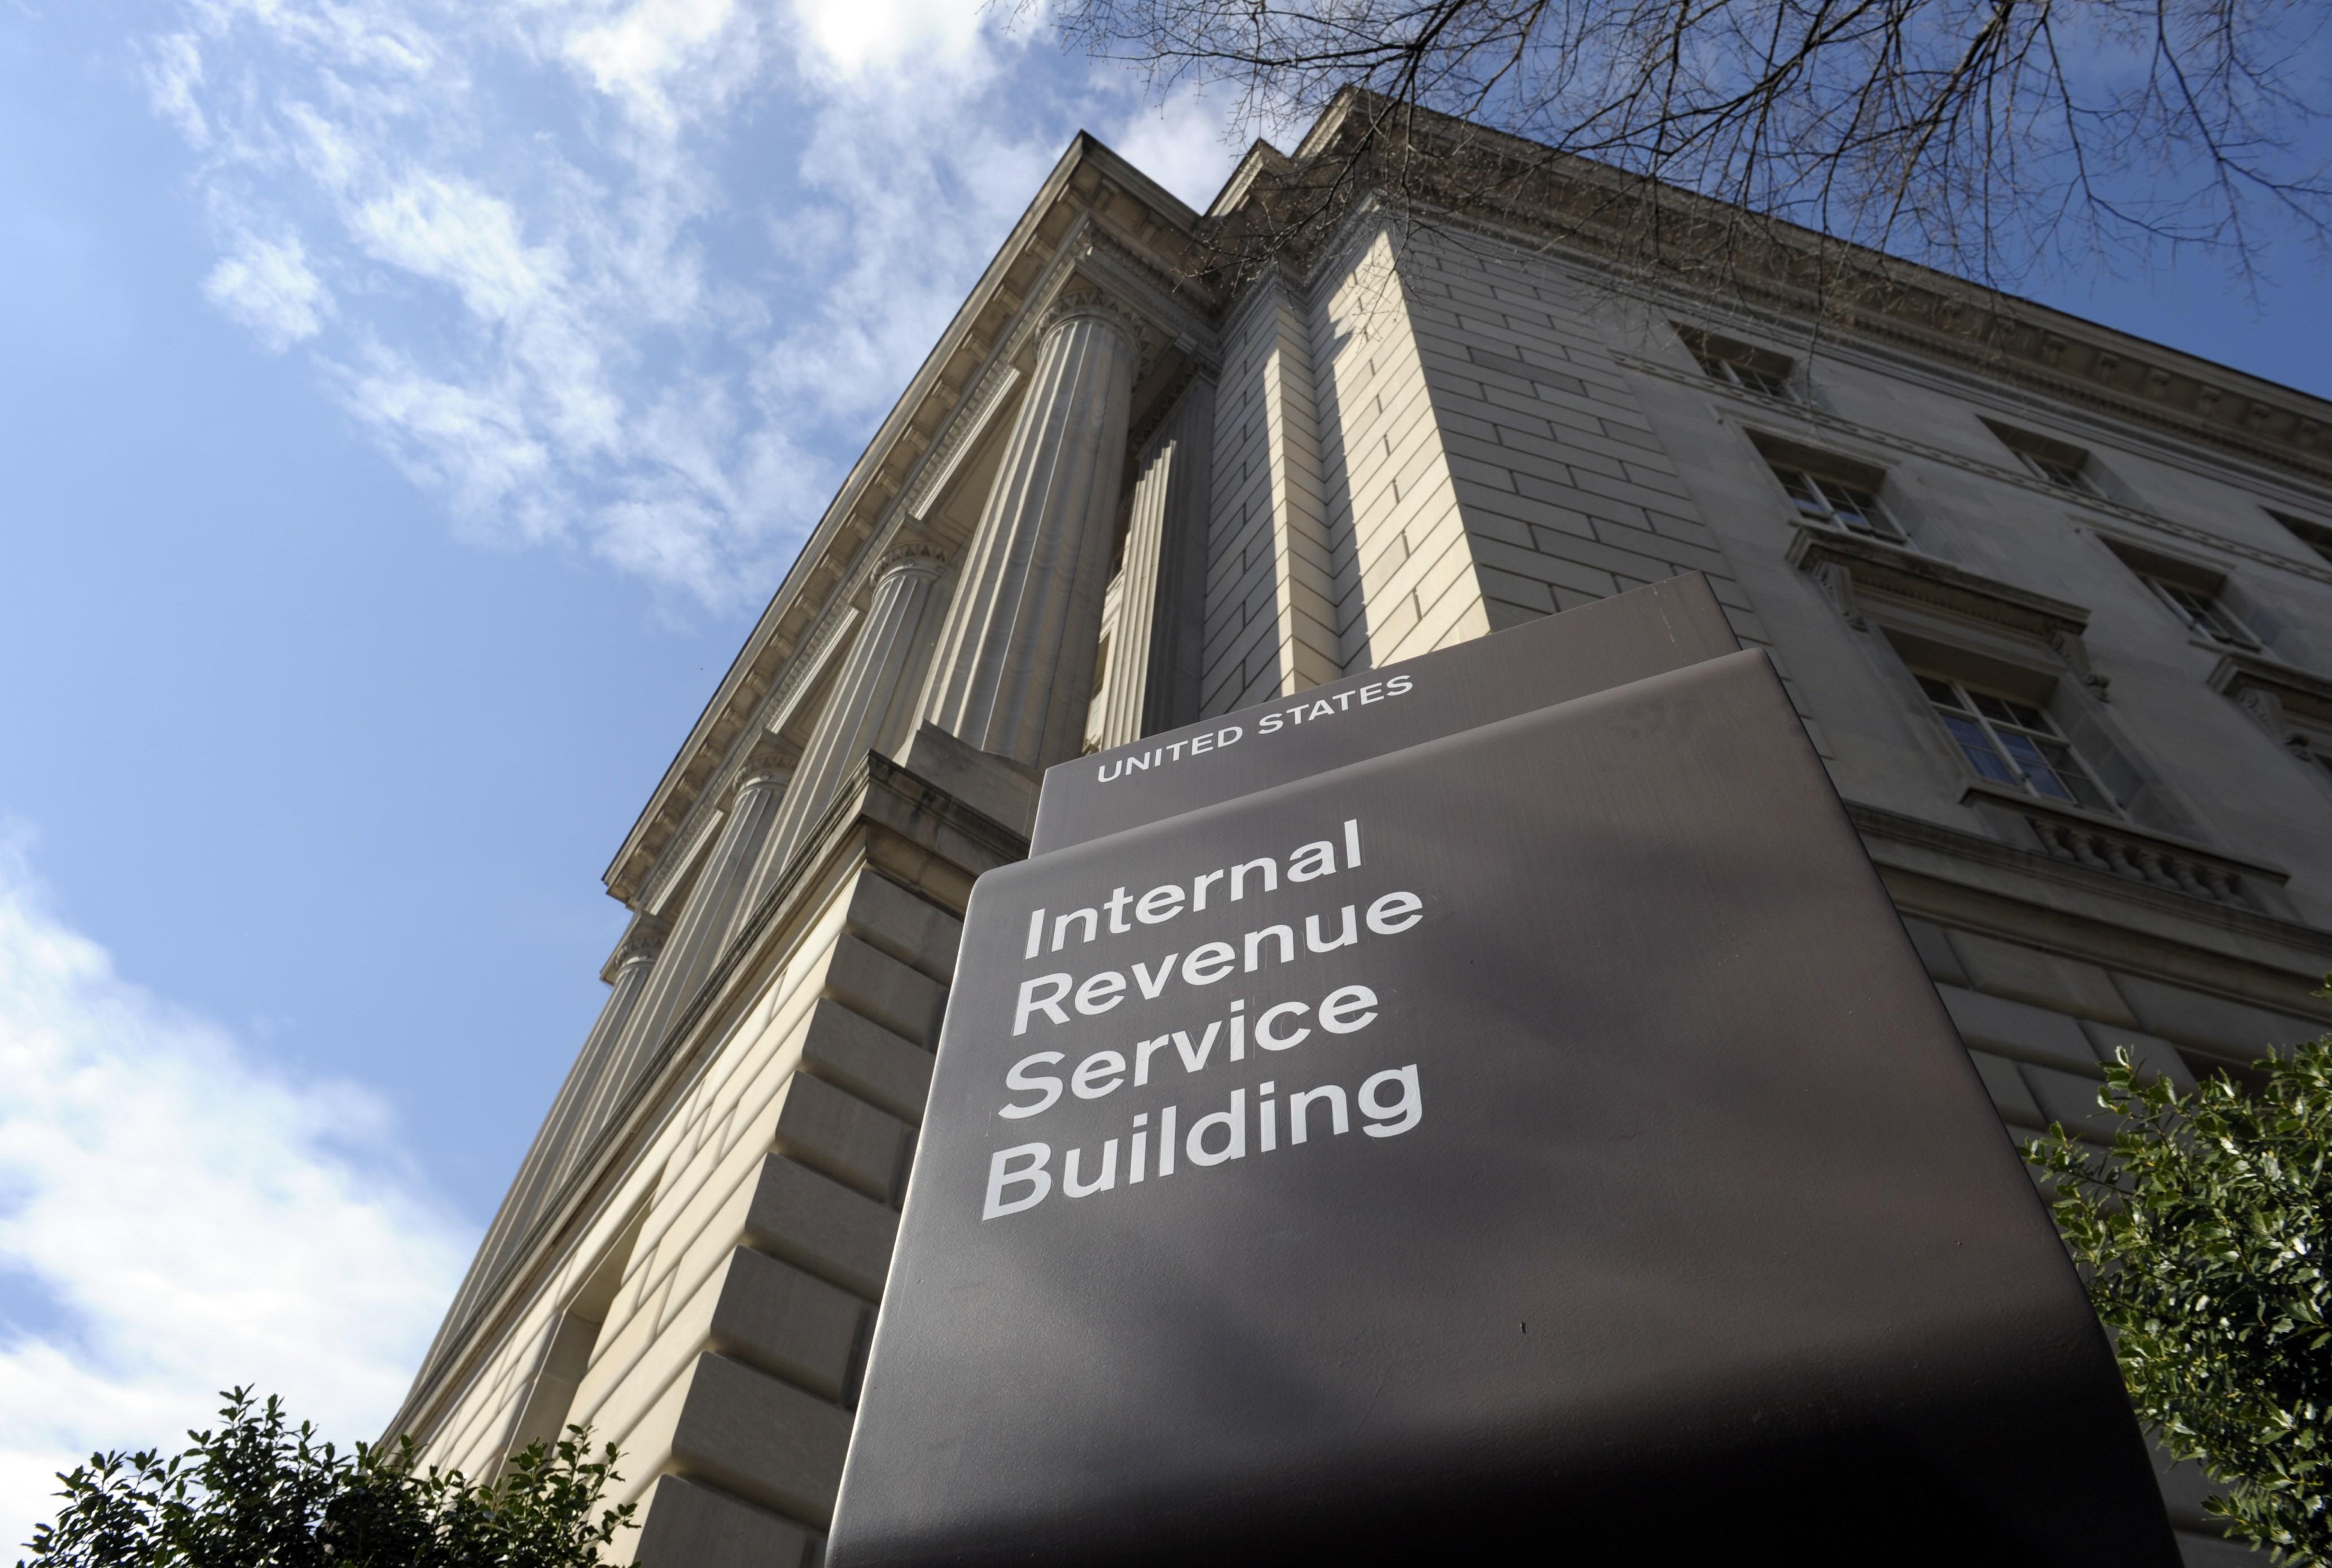 Department of Treasury - IRS